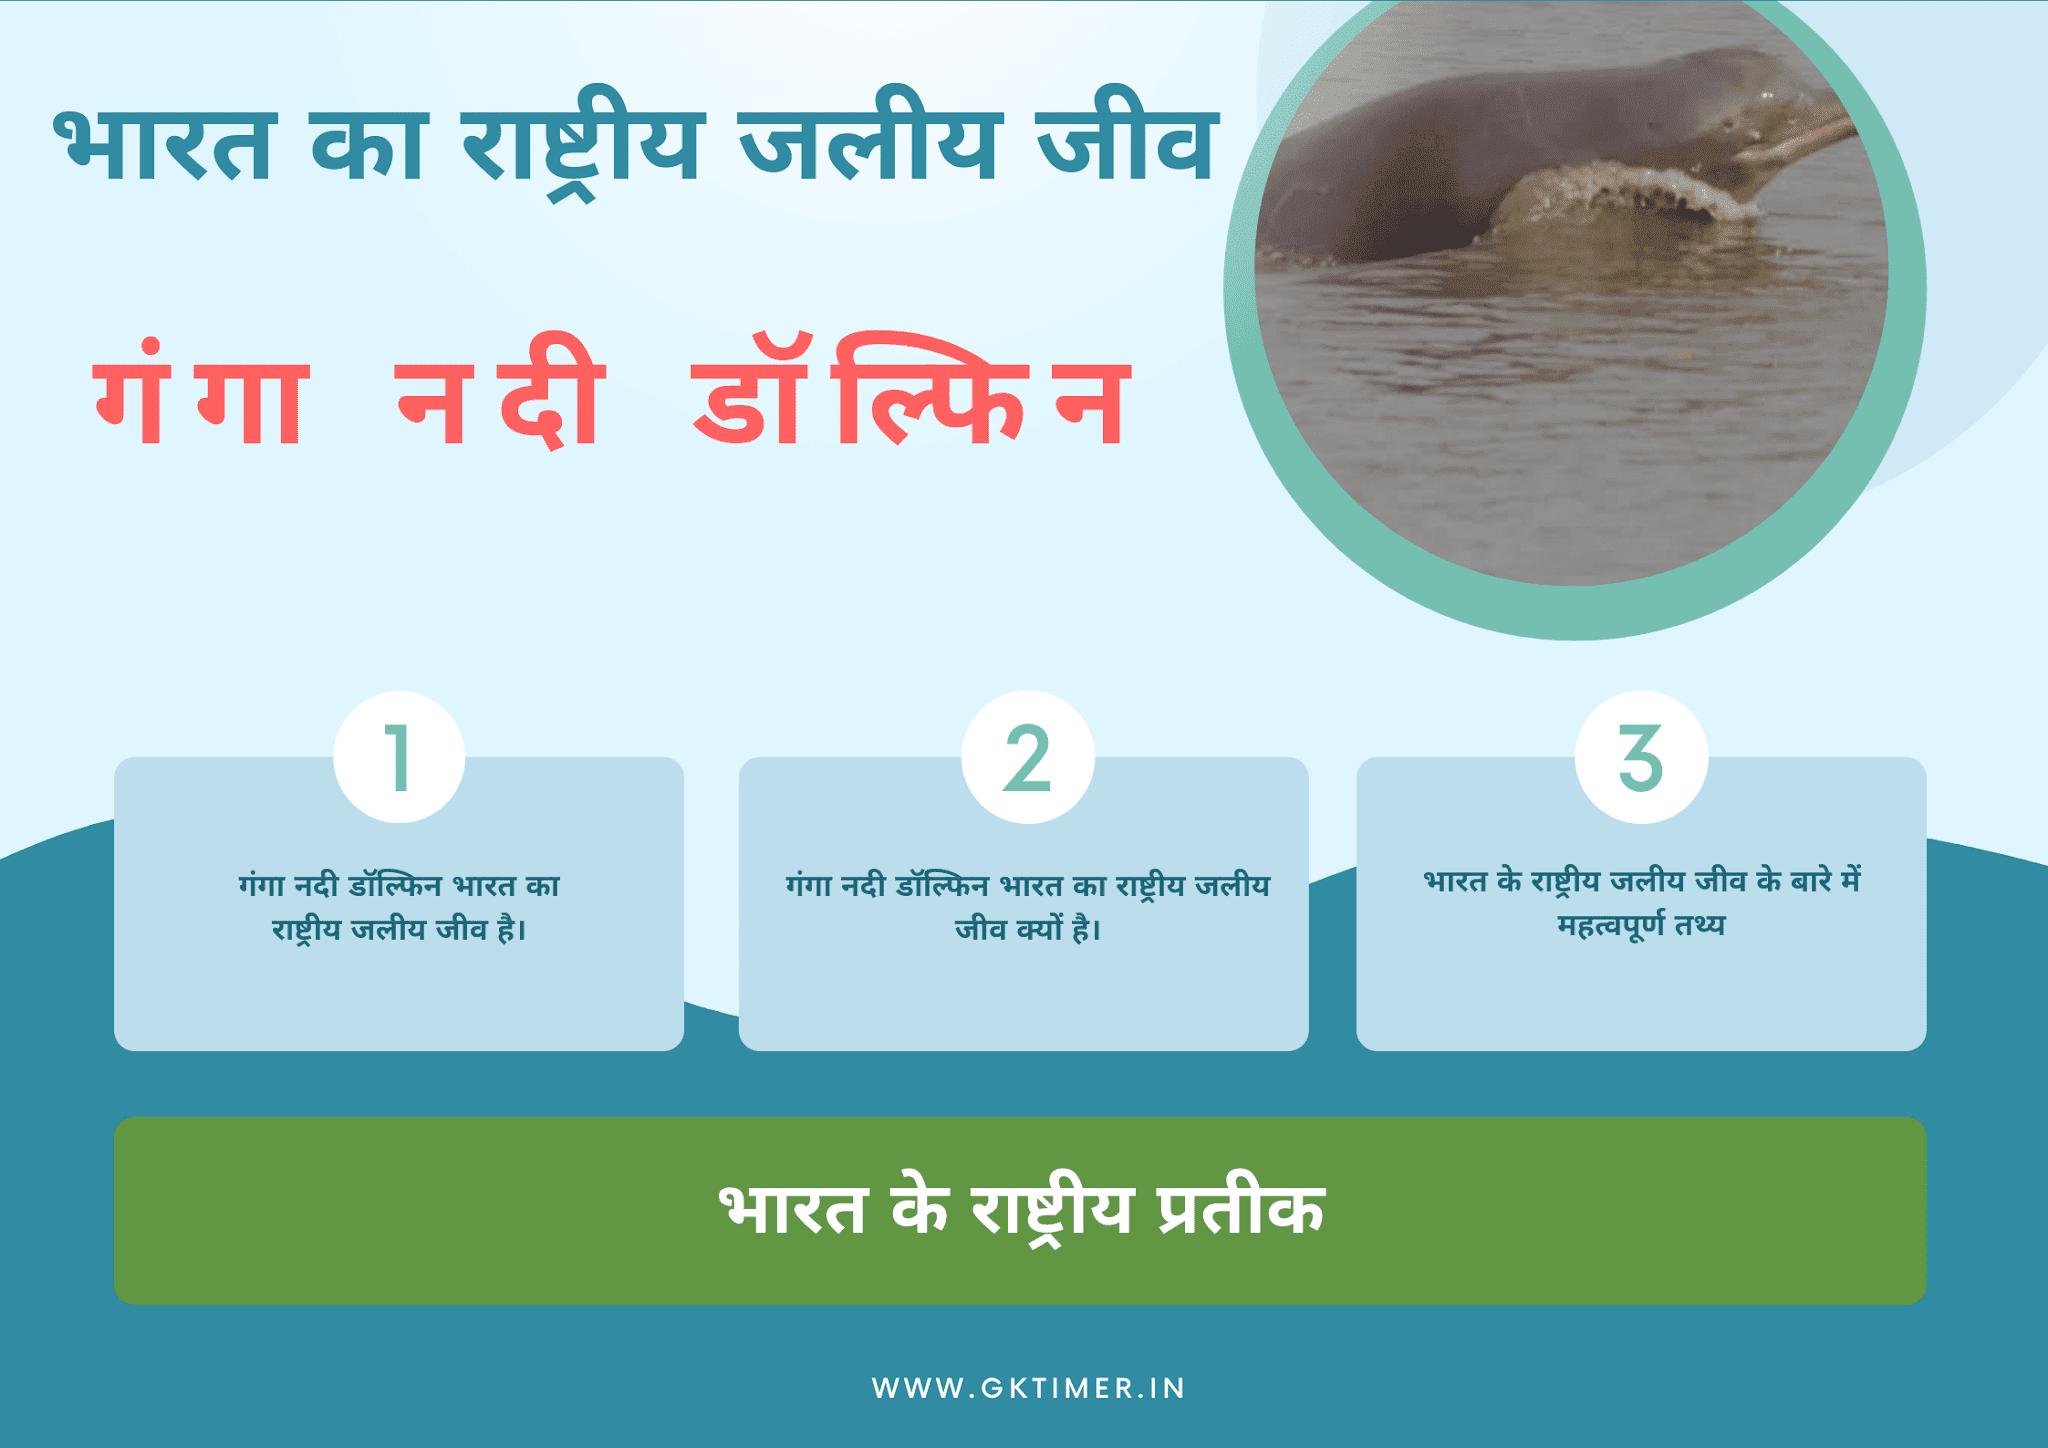 राष्ट्रीय जलीय जीव : गंगा नदी डॉल्फिन |National Aquatic Animal of India in Hindi : Ganges River Dolphin